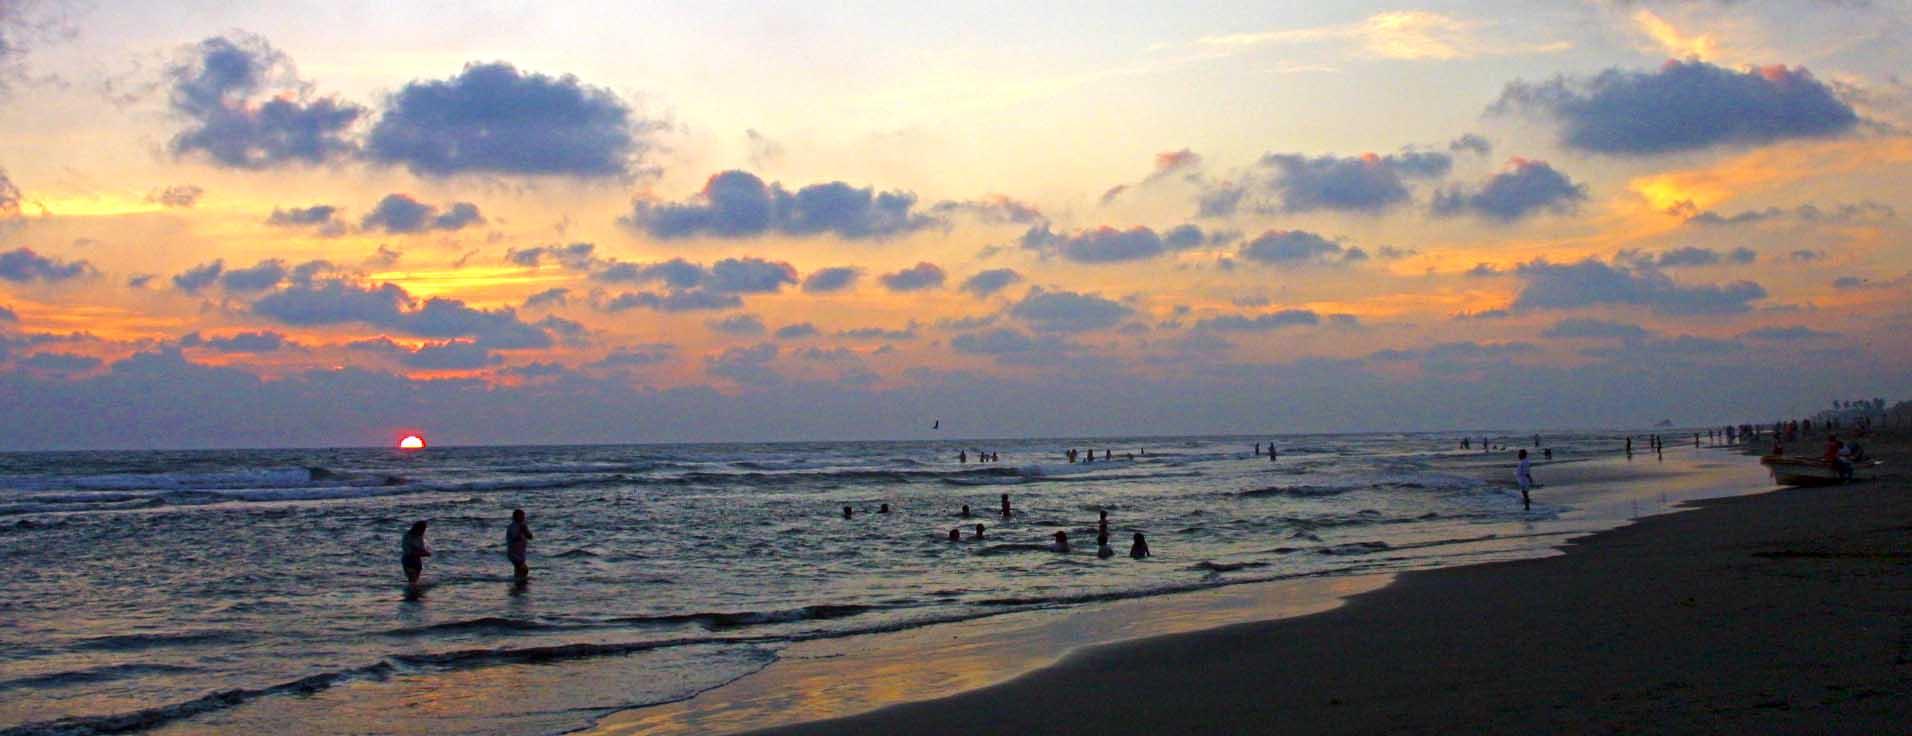 Best Buy Insurance >> Playa Azul, Michoacan, Mexico – Mexico News